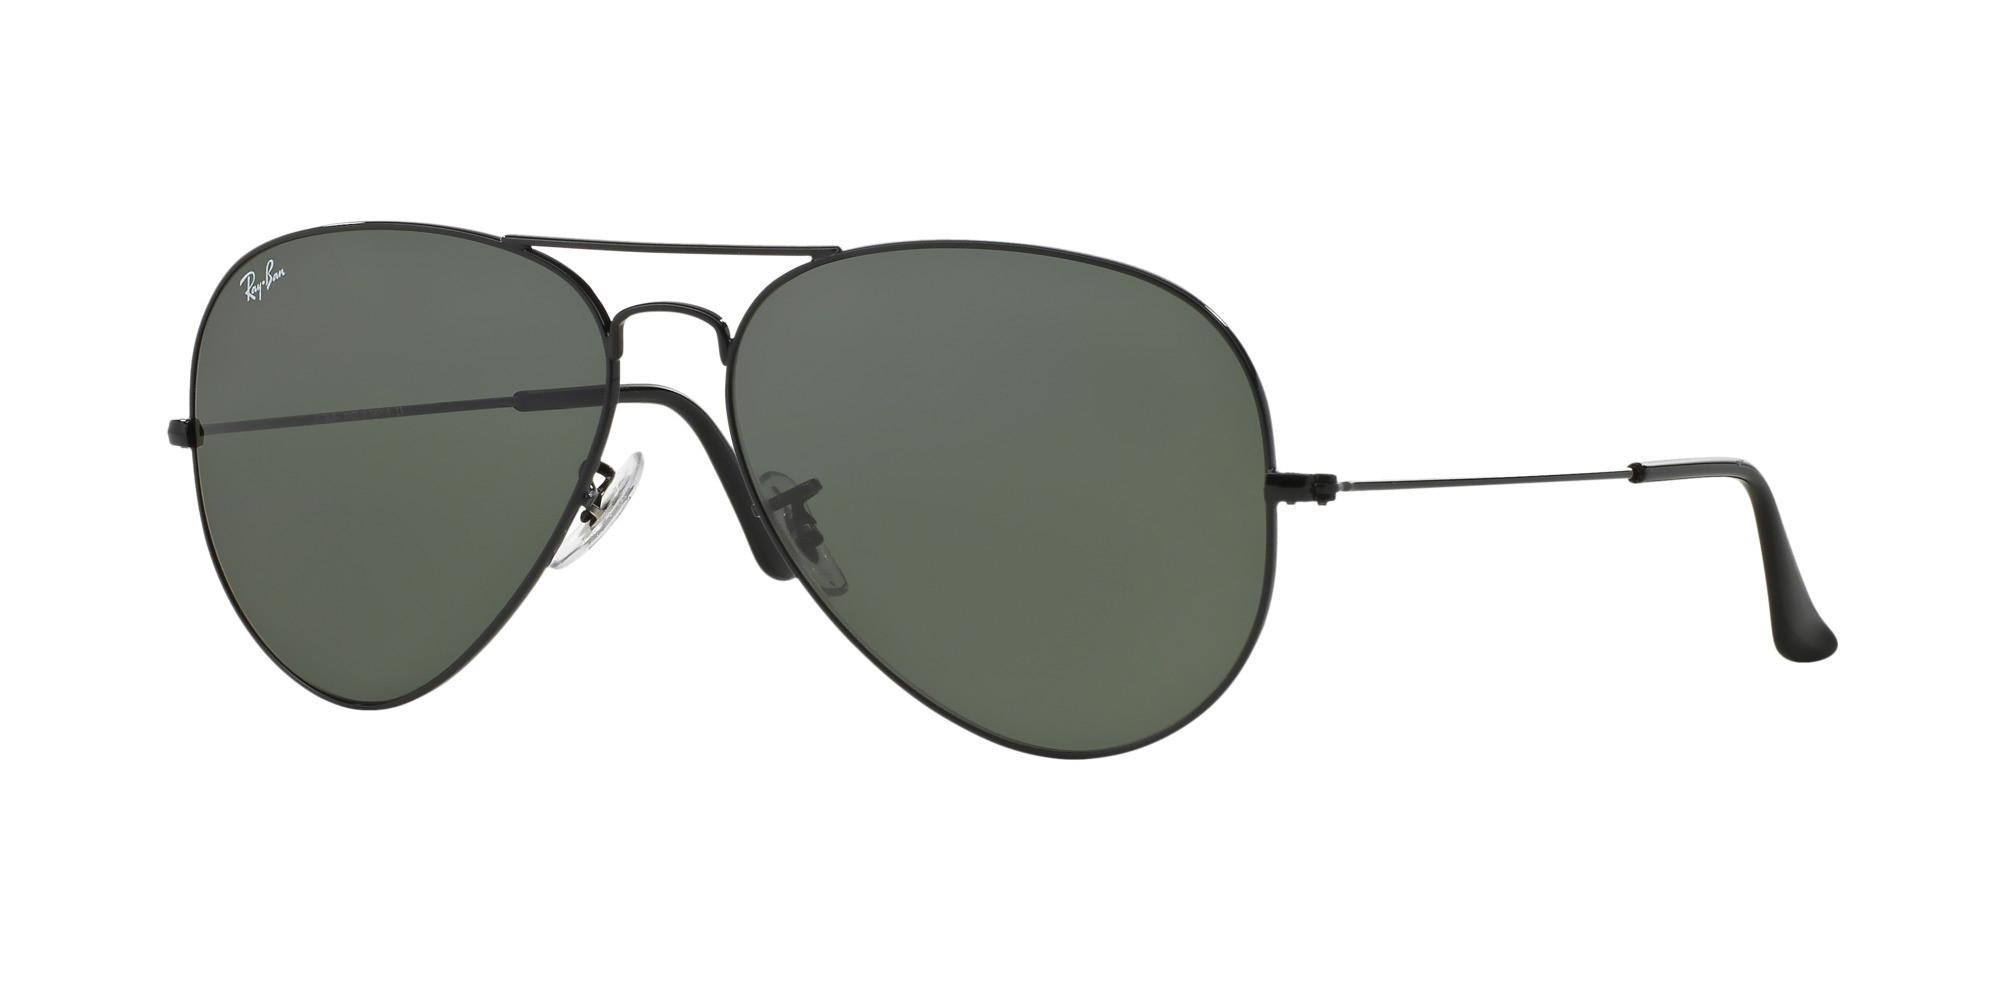 Gafas de sol RAY-BAN AVIATOR LARGE METAL II RB 3026 L2821